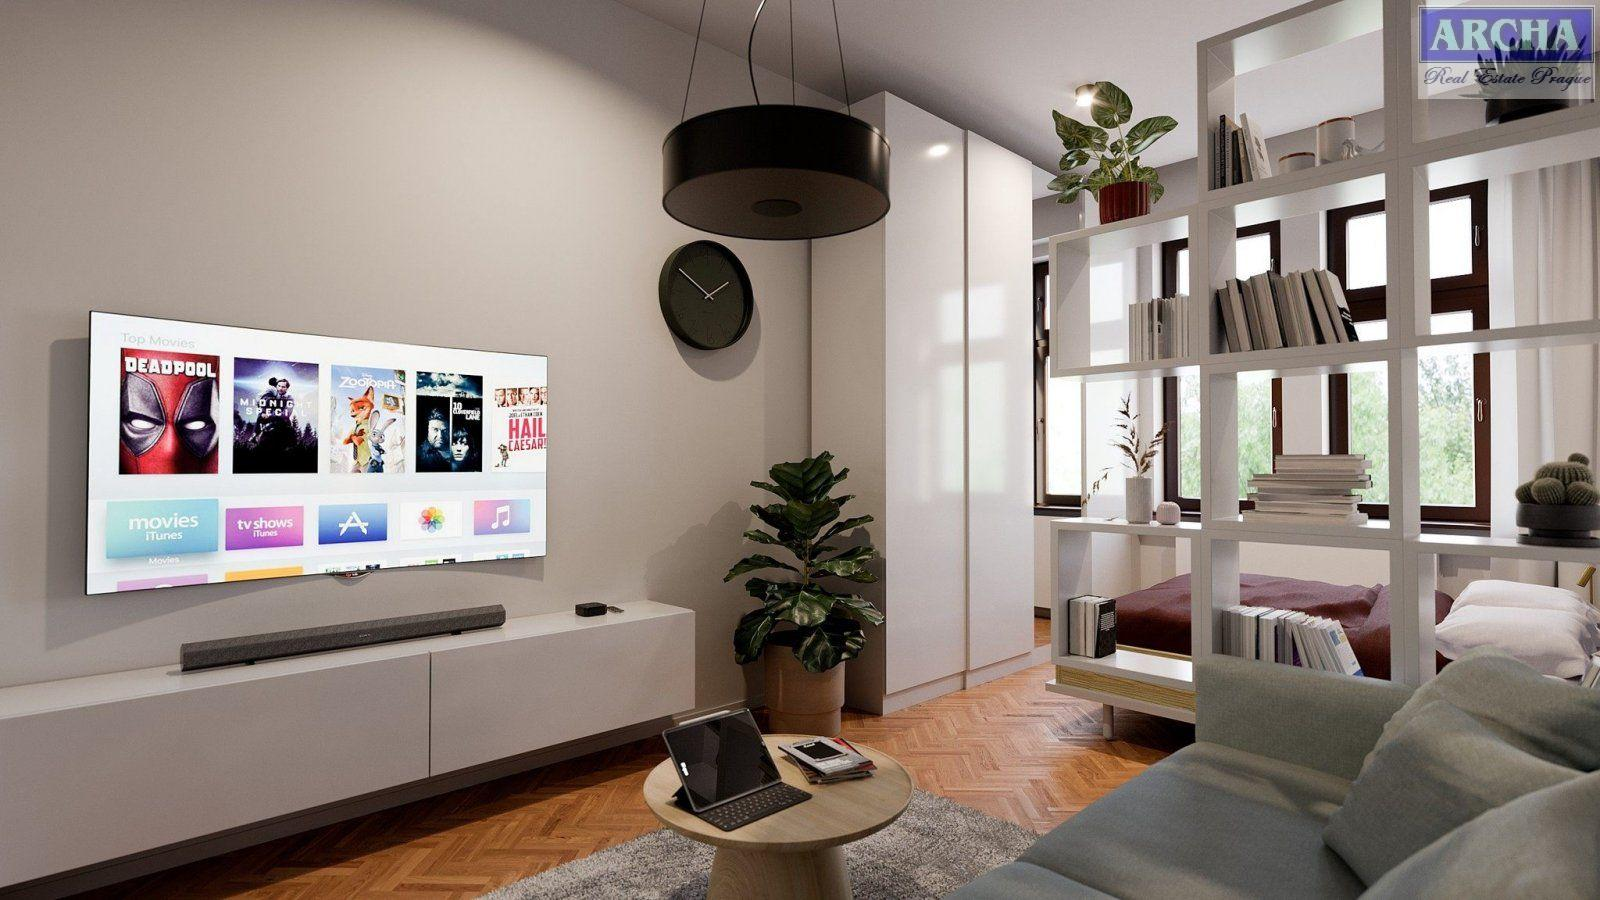 Prodej bytu 2+1, 64 m2, pavlač 2,3 m2,  2.NP,  PRAHA 8 Palmovka